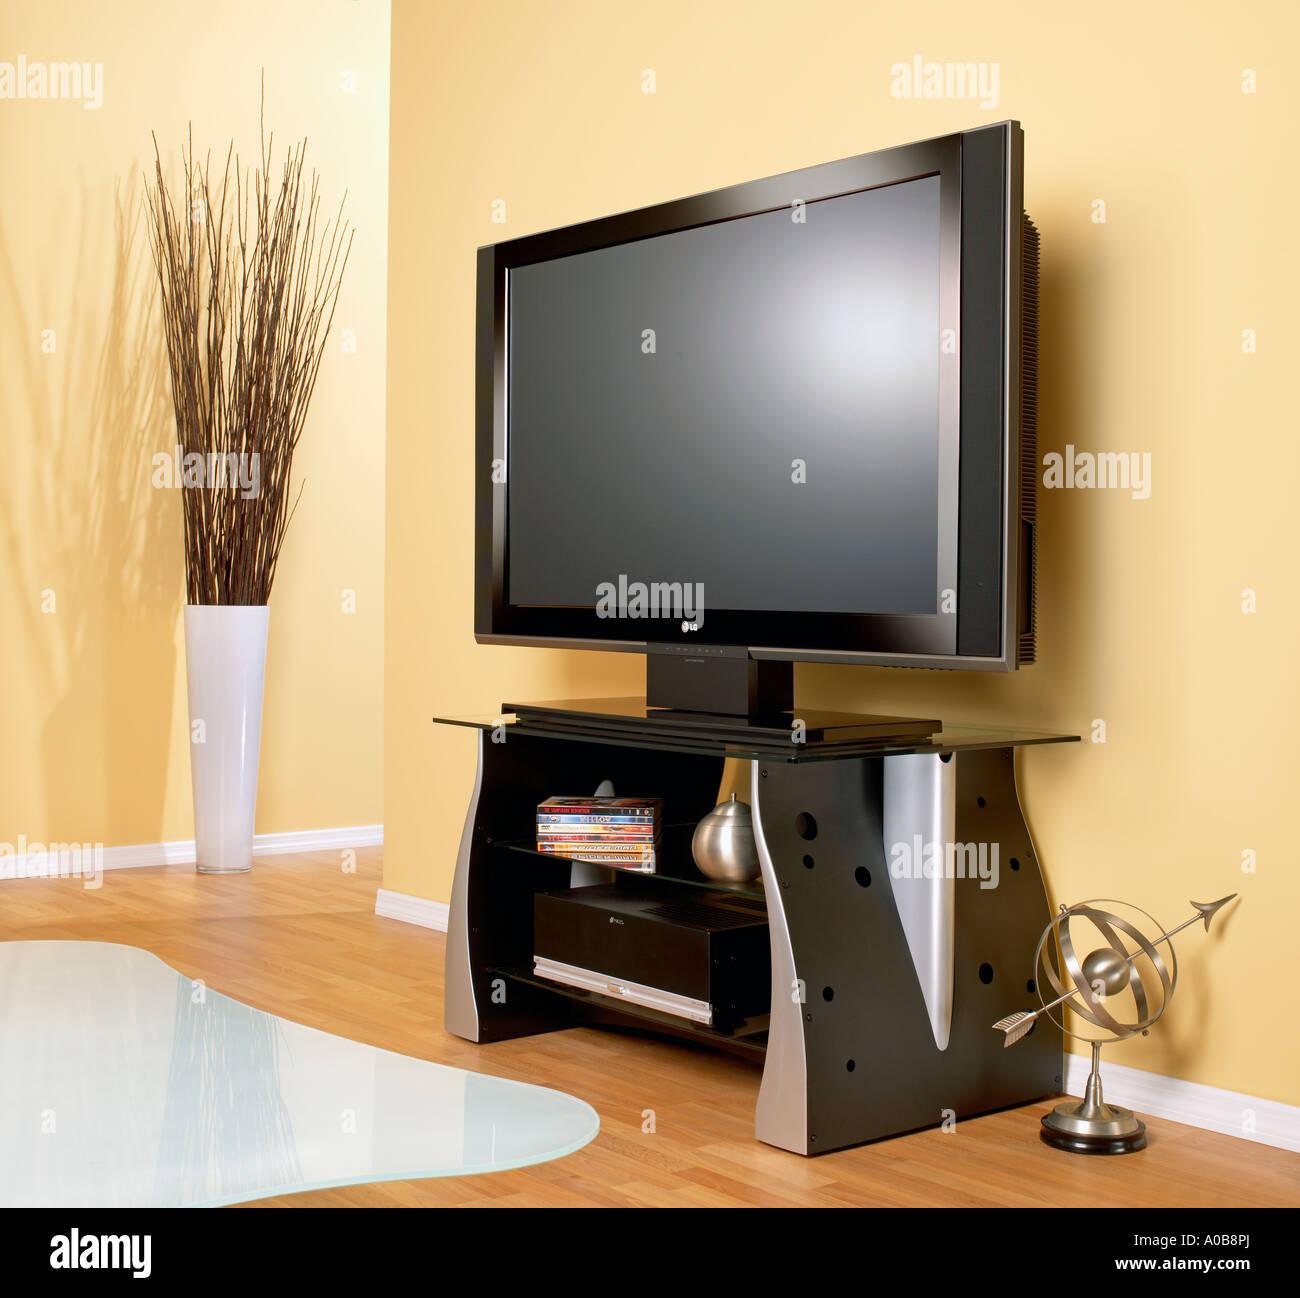 Plasma TV television flat screen monitor in room horizontal - Stock Image